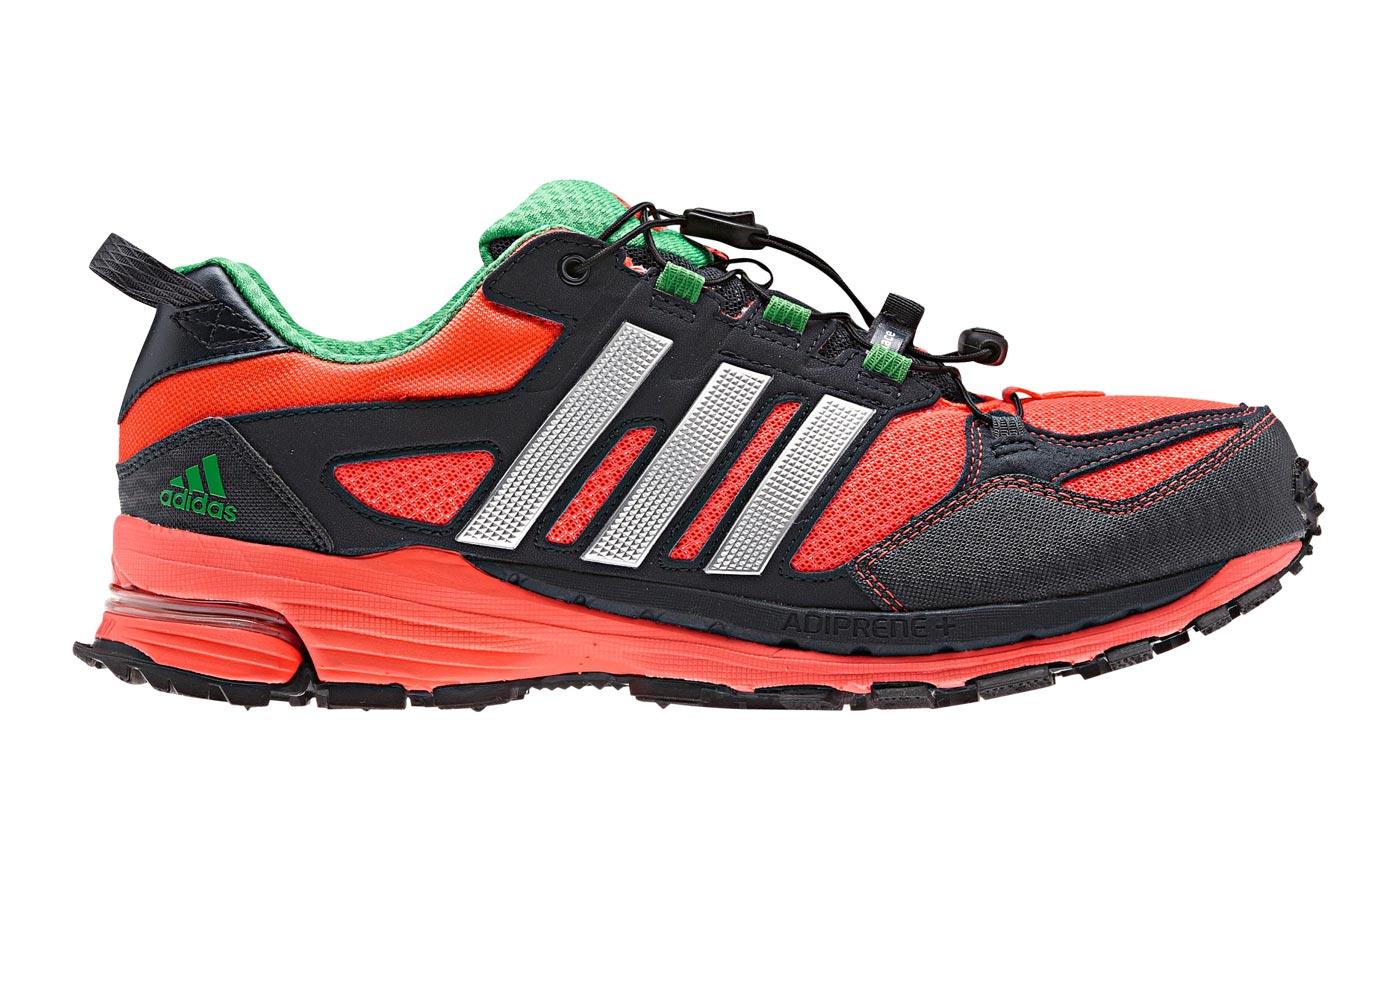 52280f936063d Zapatillas Adidas SUPERNOVA RIOT 5M